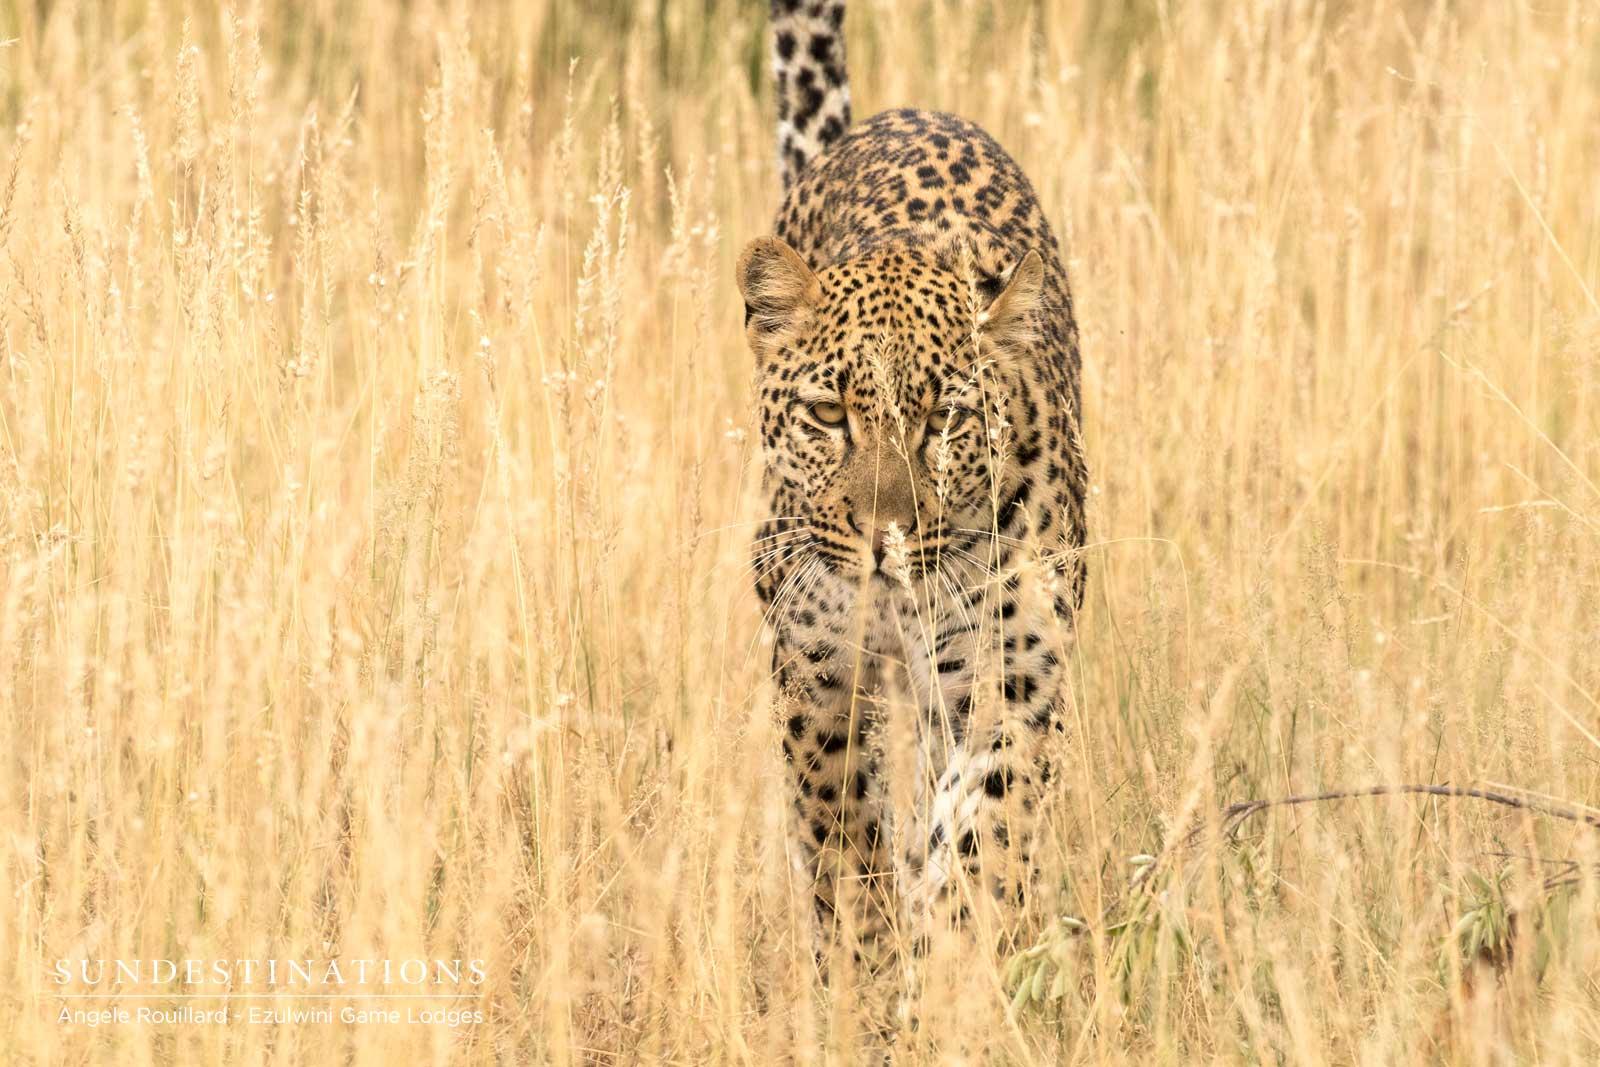 Thuli Leopard at Ezulwini Game Lodges